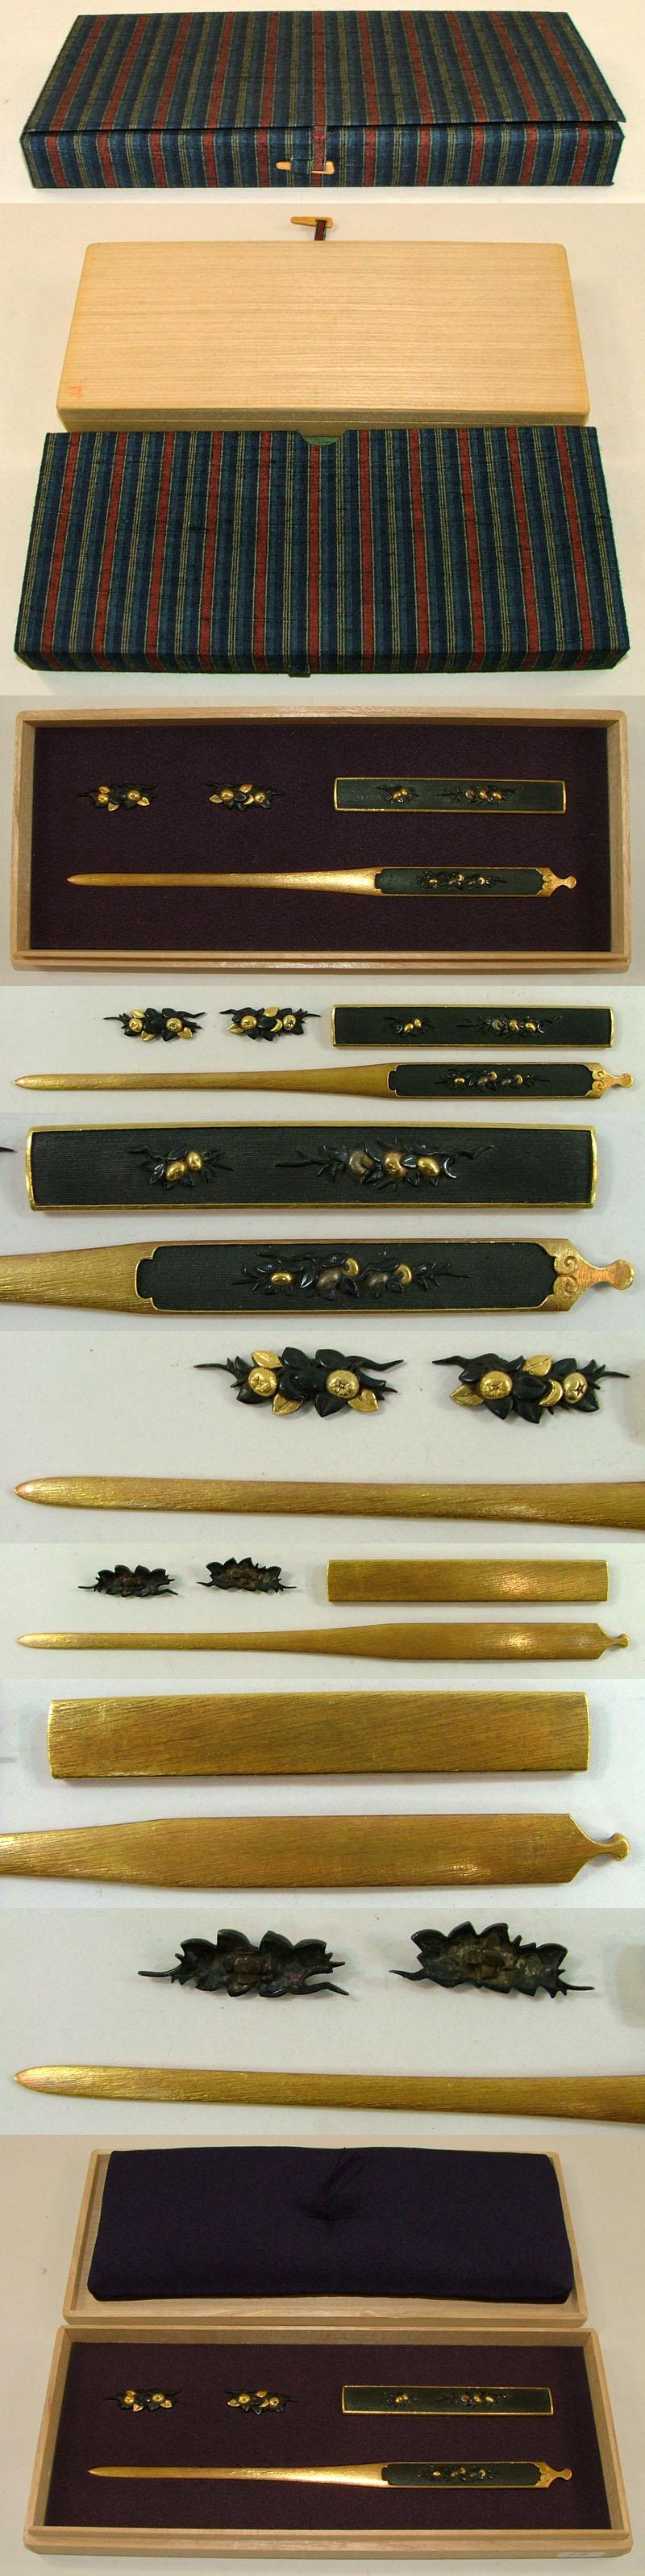 橘図3所物 無銘 程乗 (後藤程乗) (9代) Picture of parts